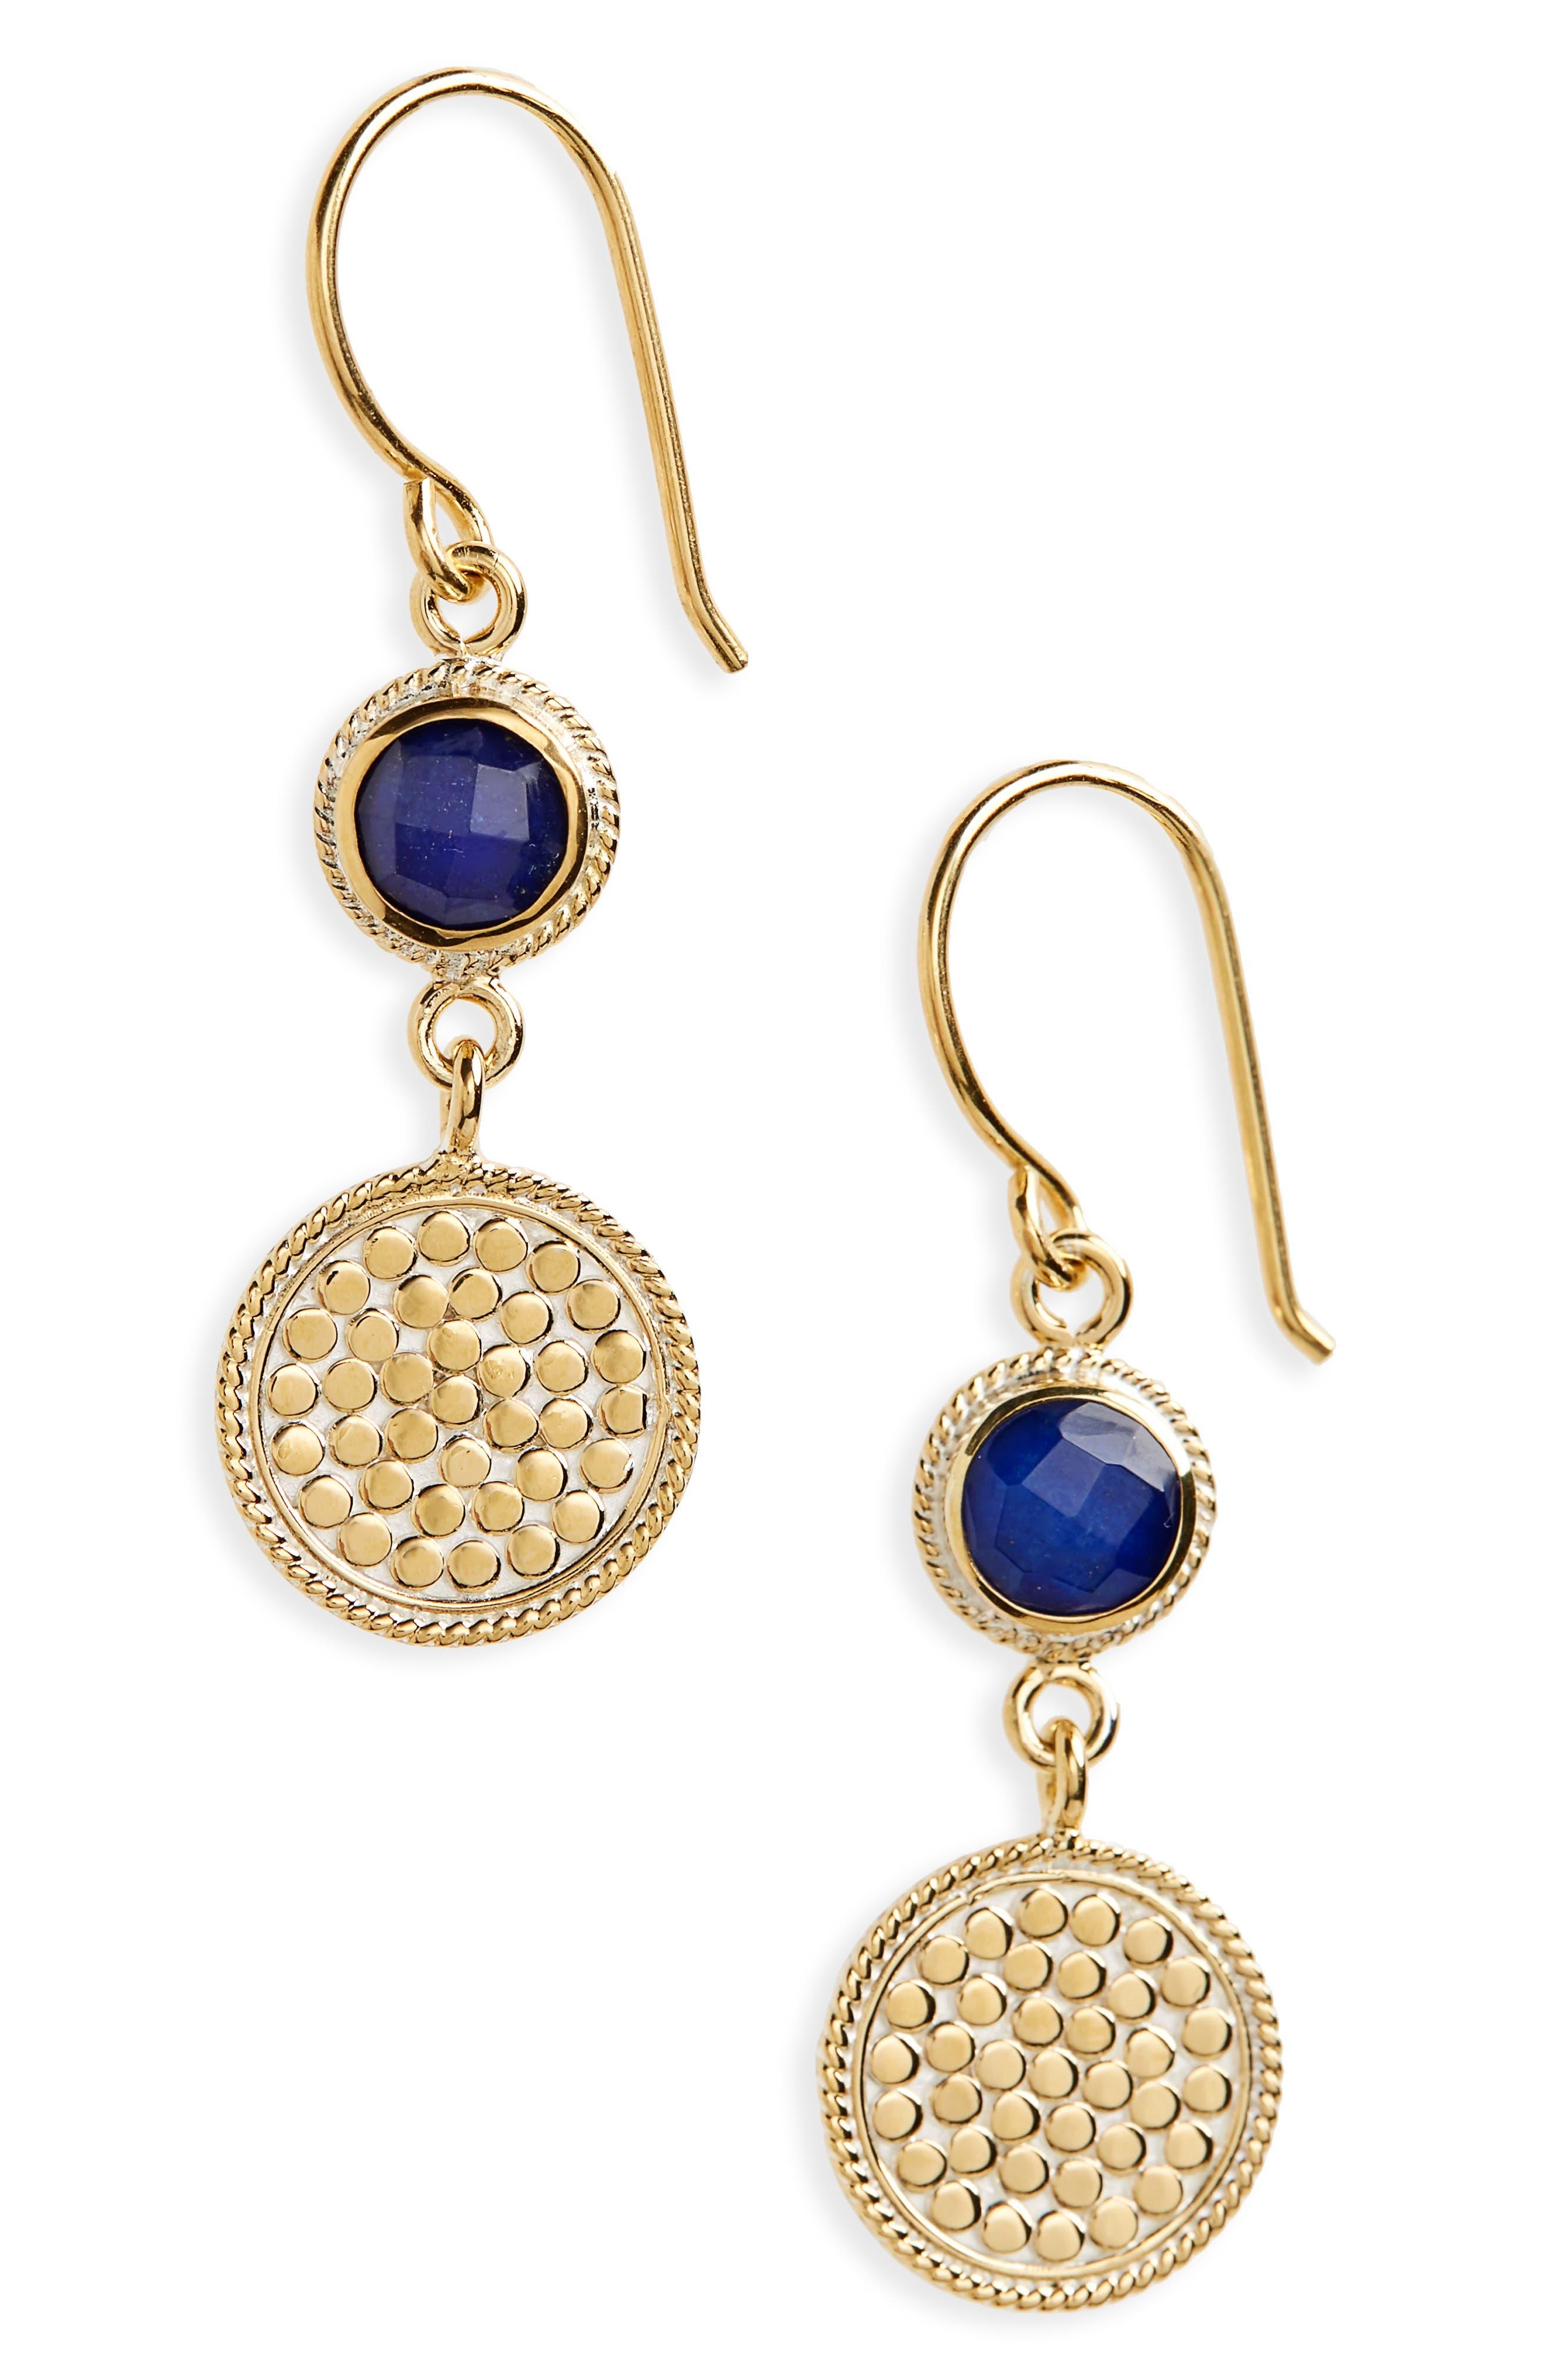 Semiprecious Stone Double Drop Earrings,                         Main,                         color, BLUE LAPIS